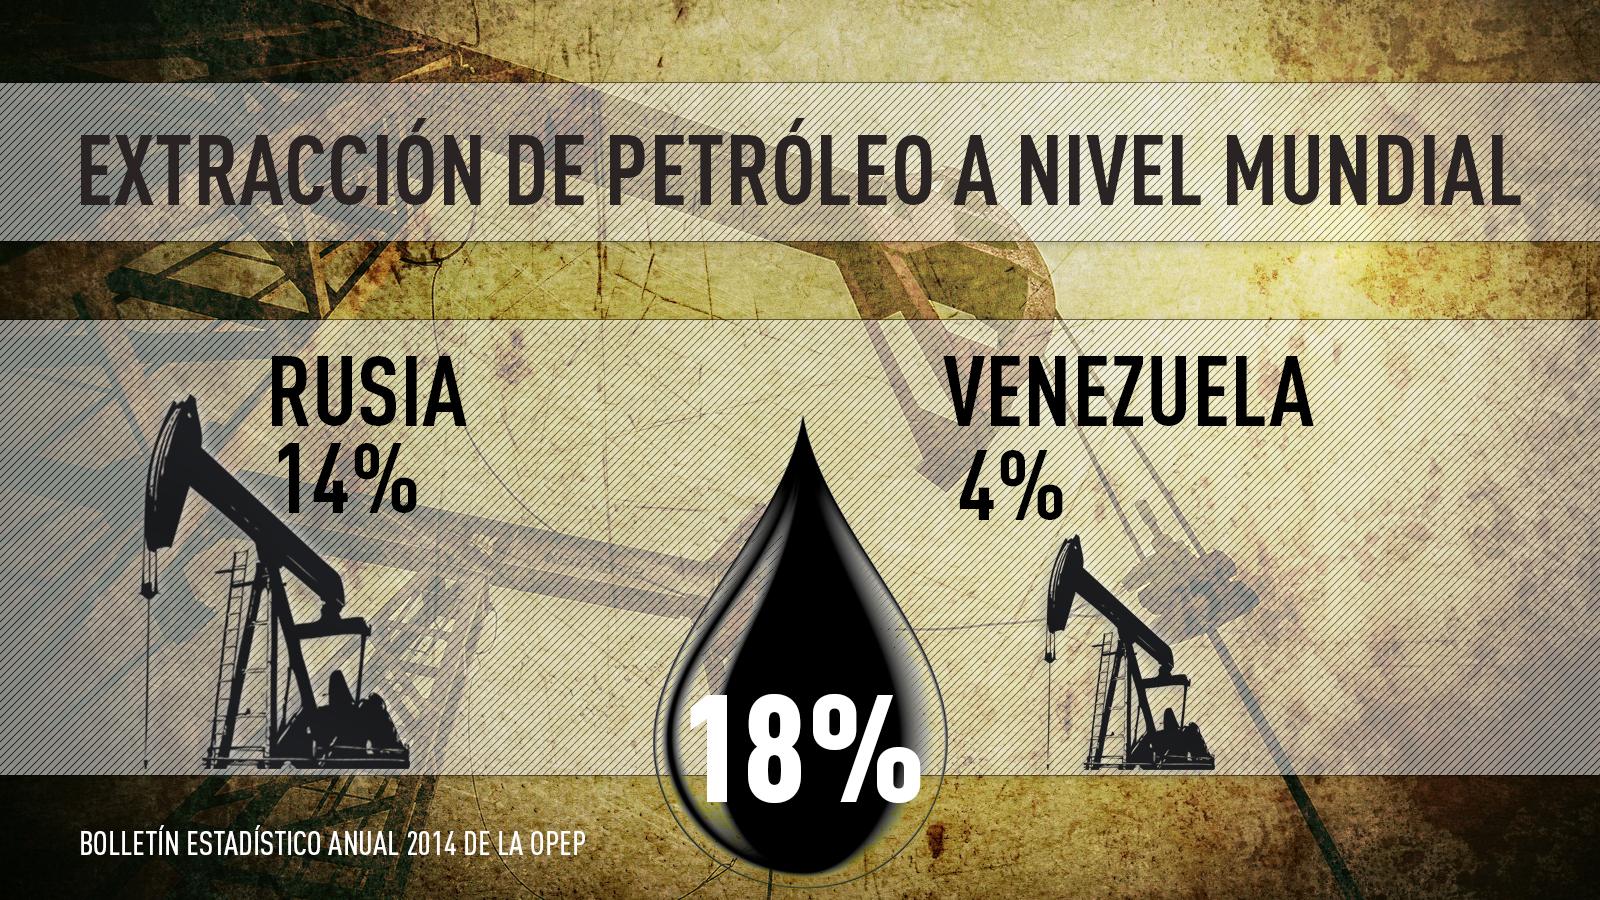 Extracción de petróleo a nivel mundial